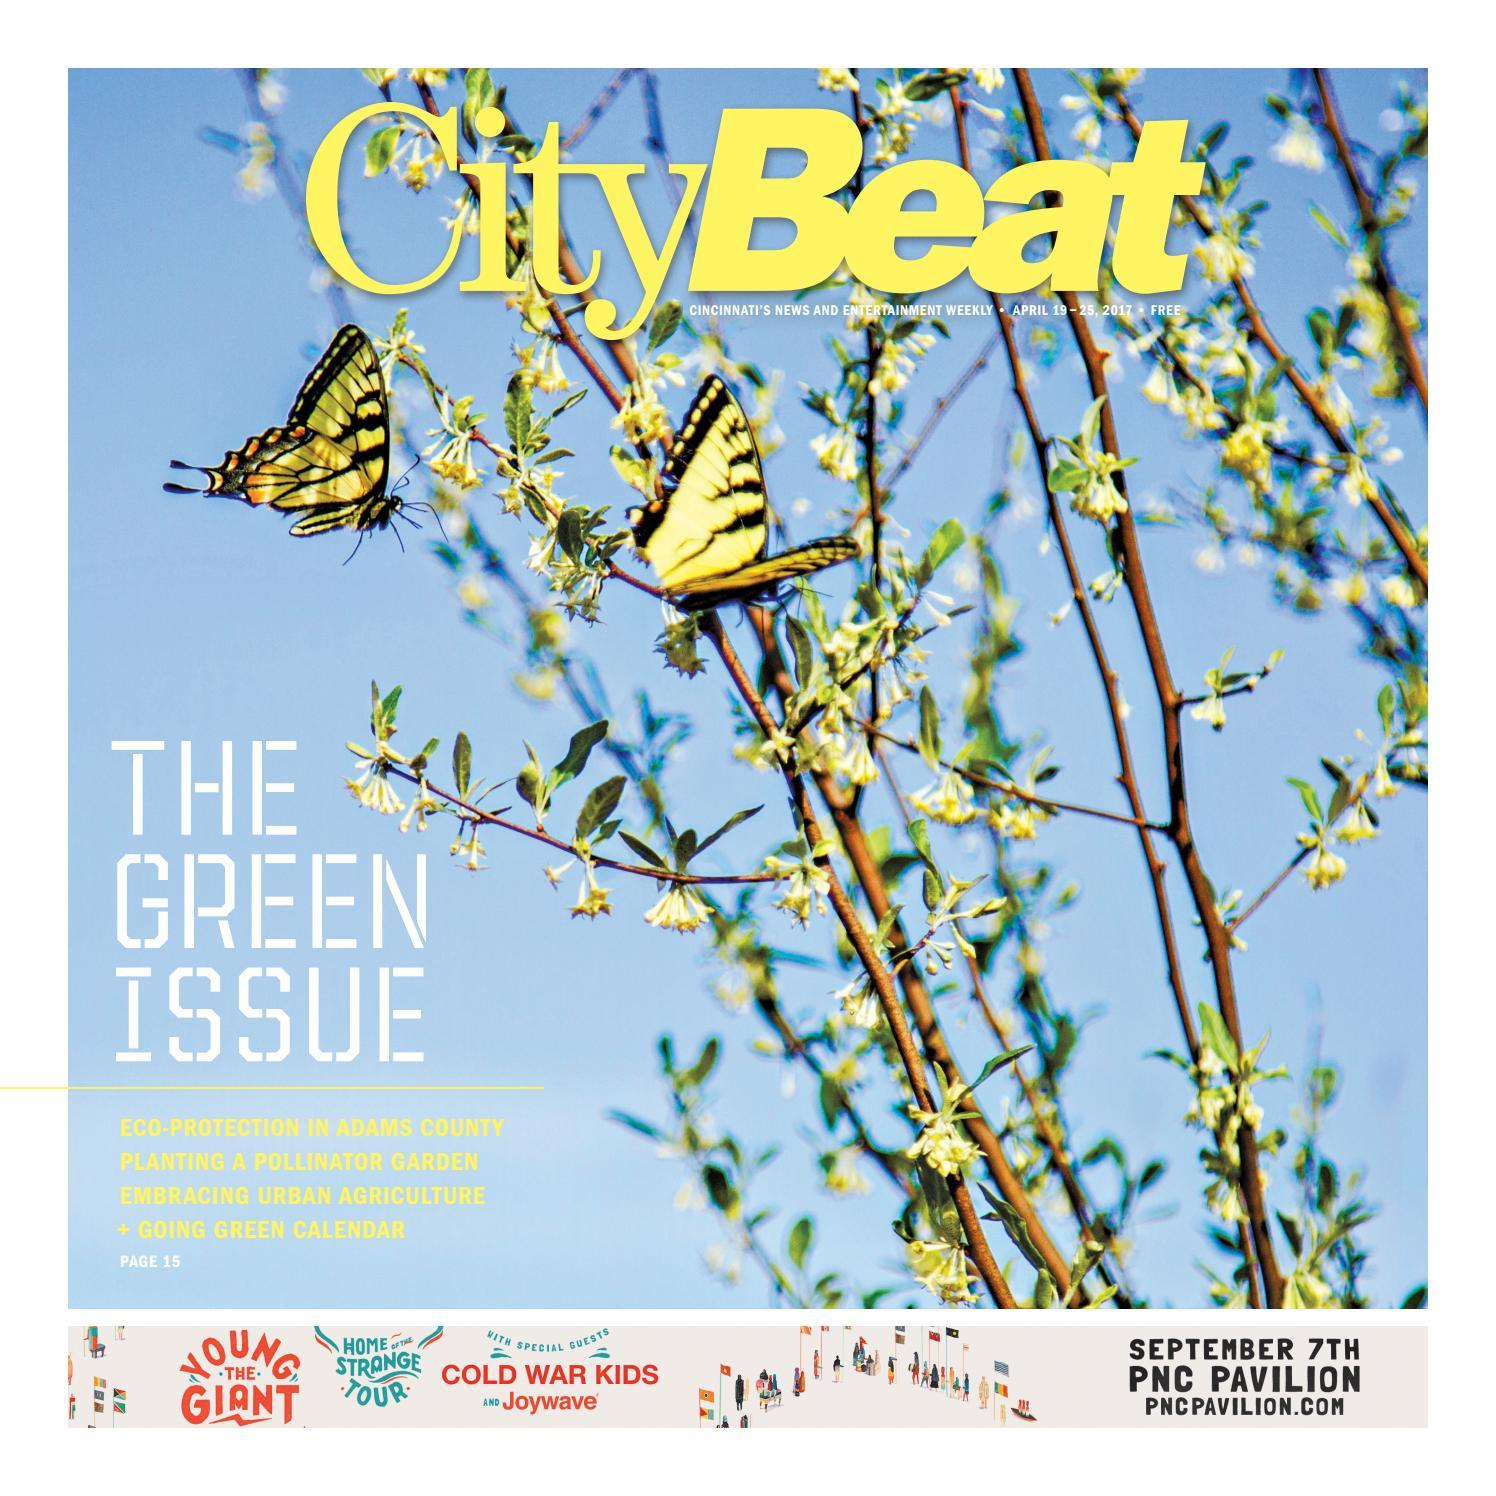 Citybeat april 19 24 2017 by cincinnati citybeat issuu malvernweather Image collections